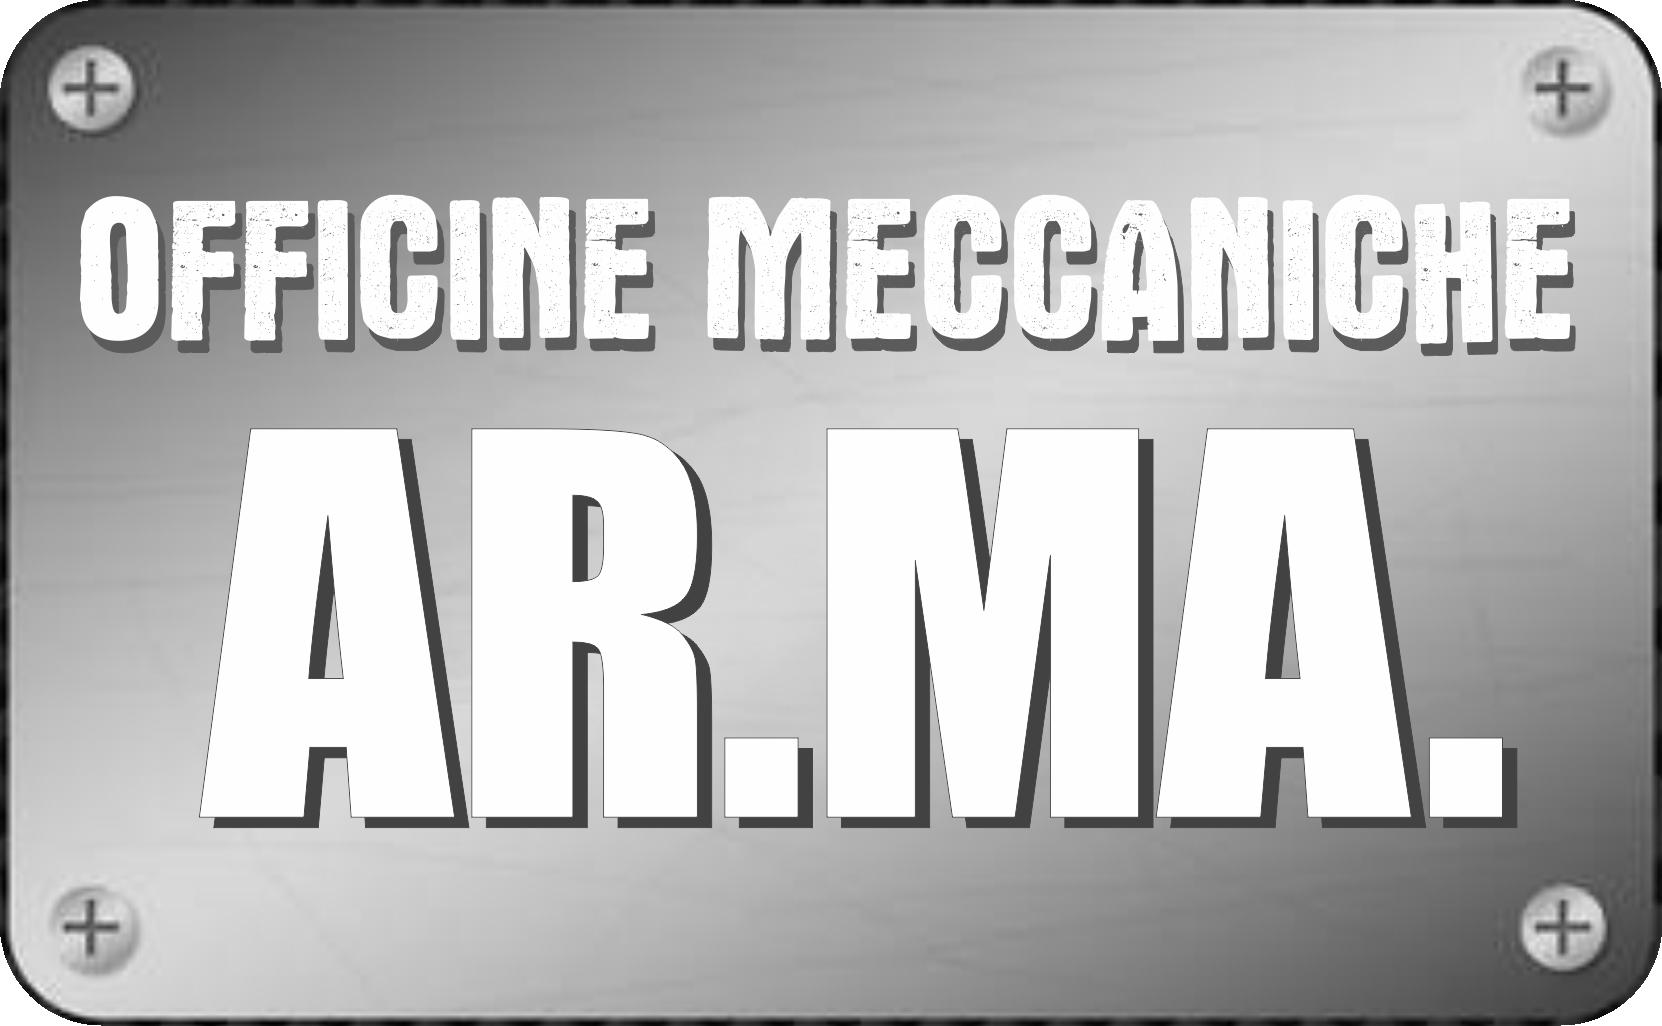 officine meccaniche ARMA